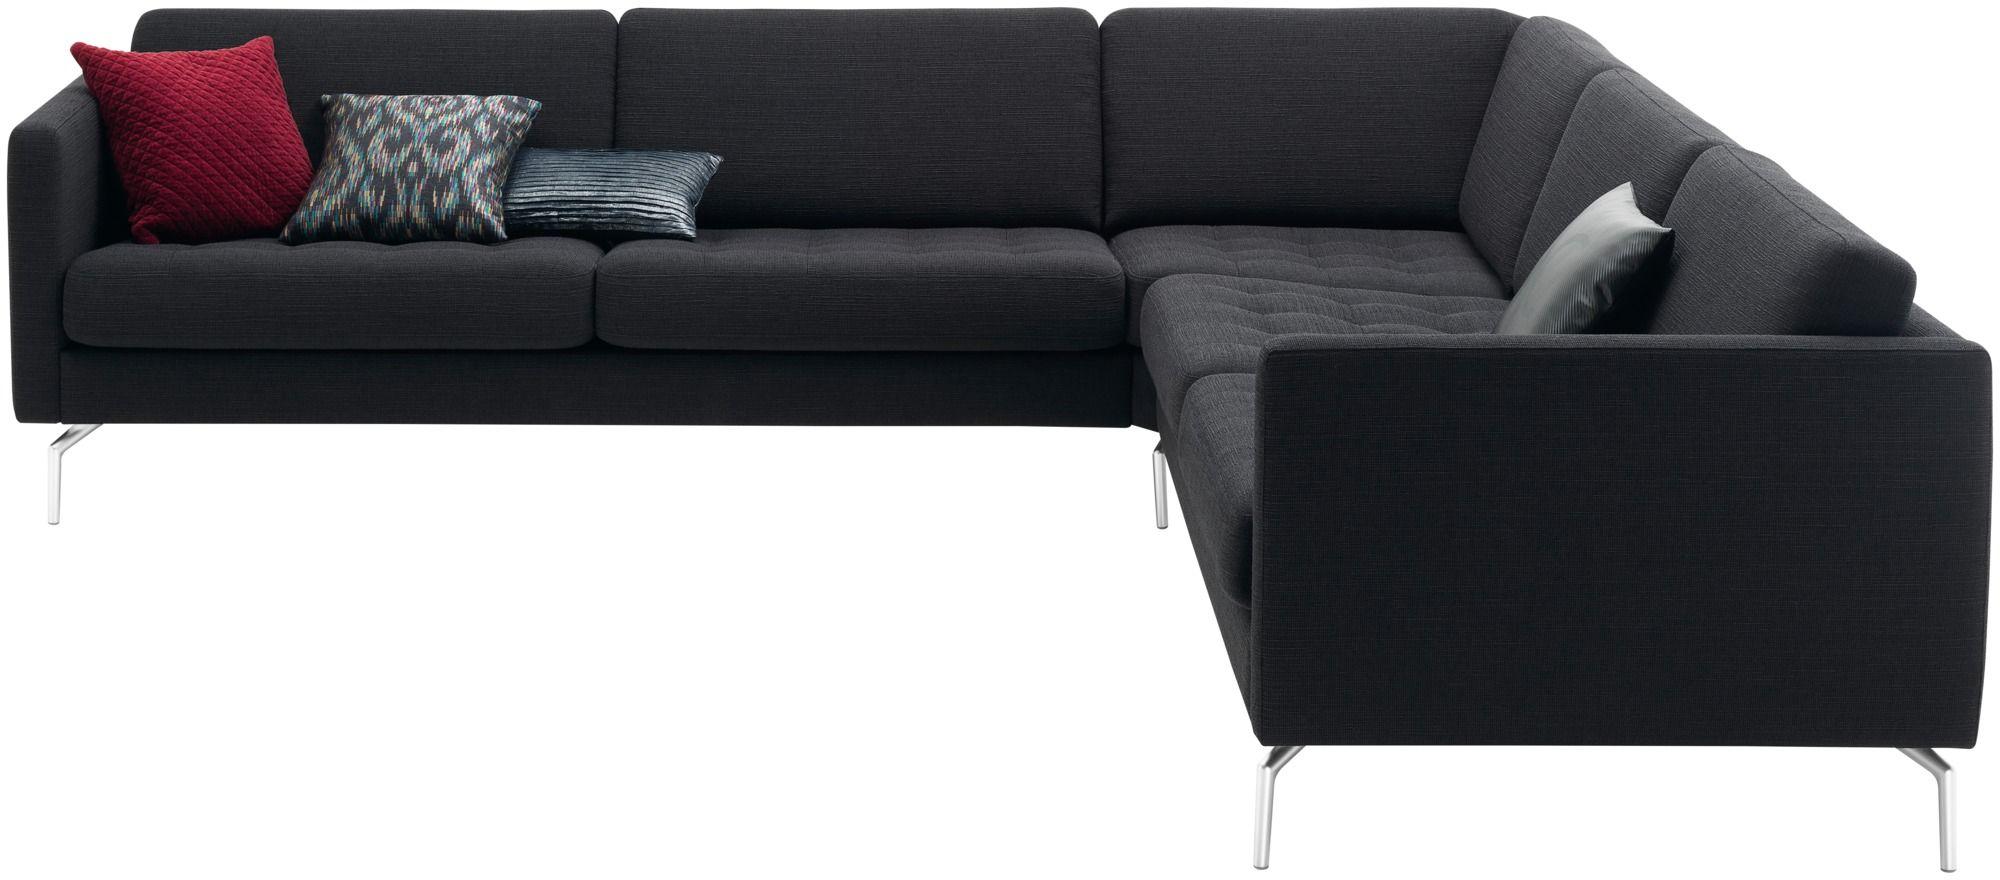 Modern Corner Sofas Quality From Boconcept Corner Sofa Modular Sofa Sofa Design